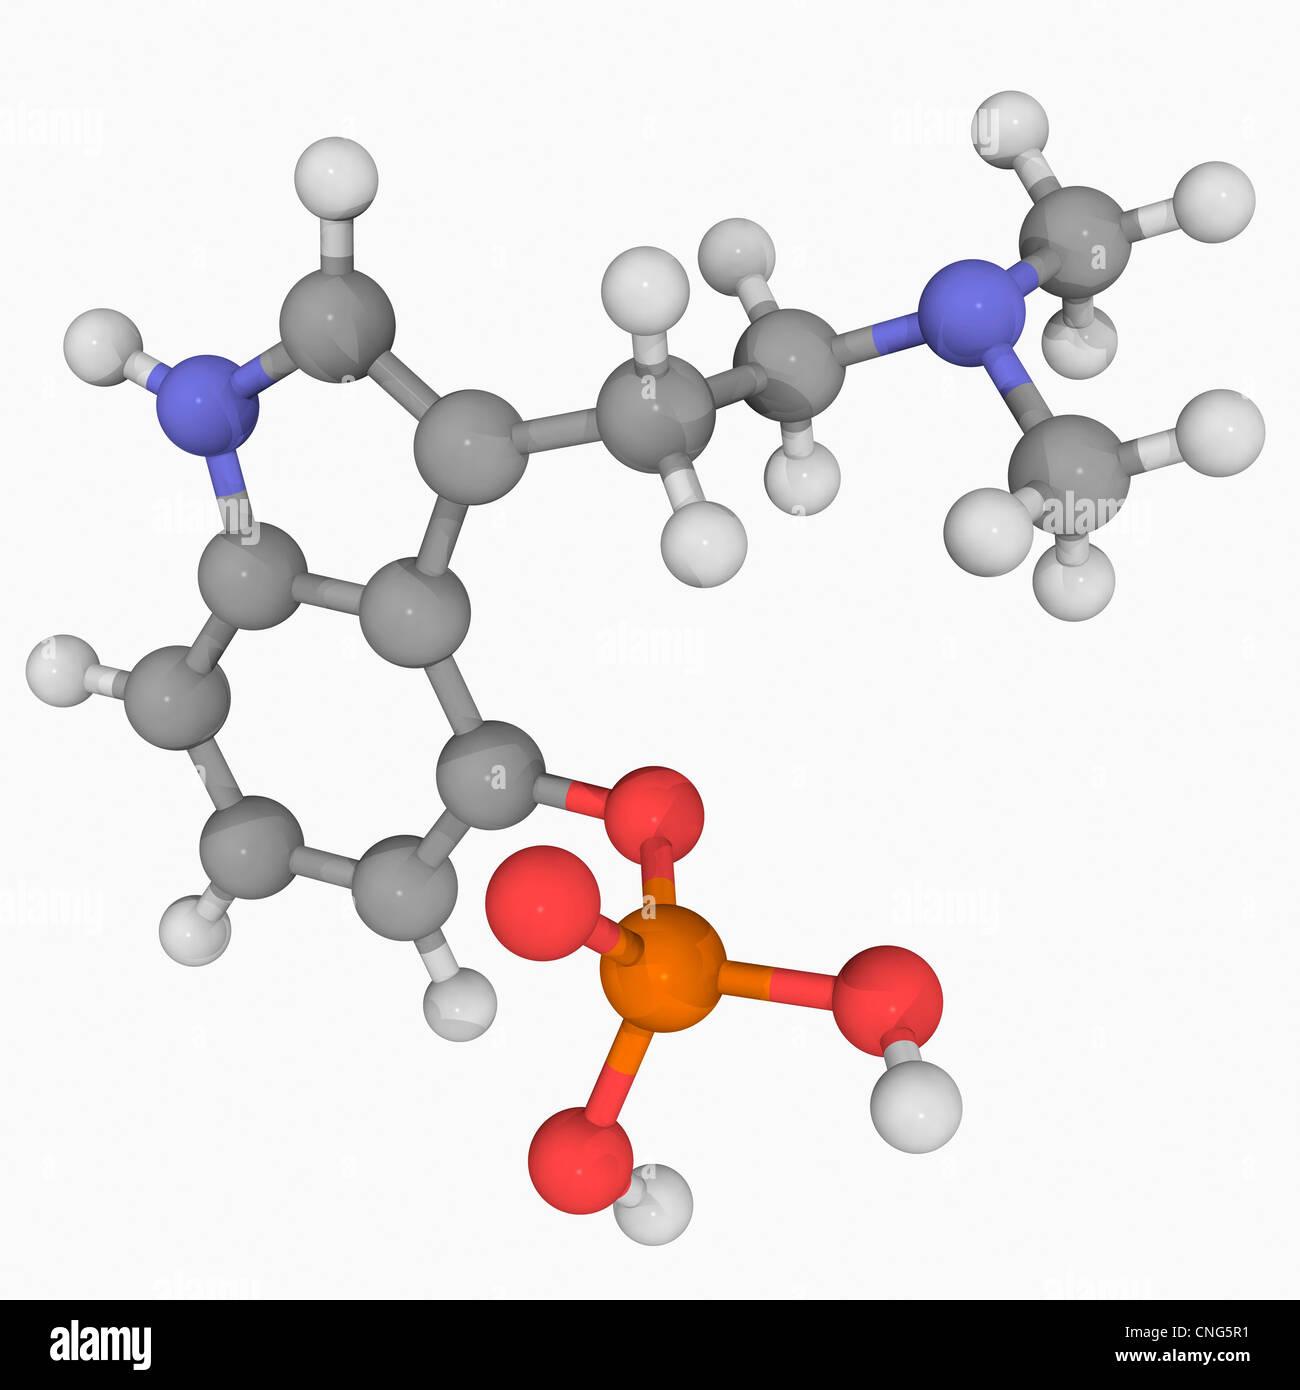 Psilocybine drug molecule - Stock Image